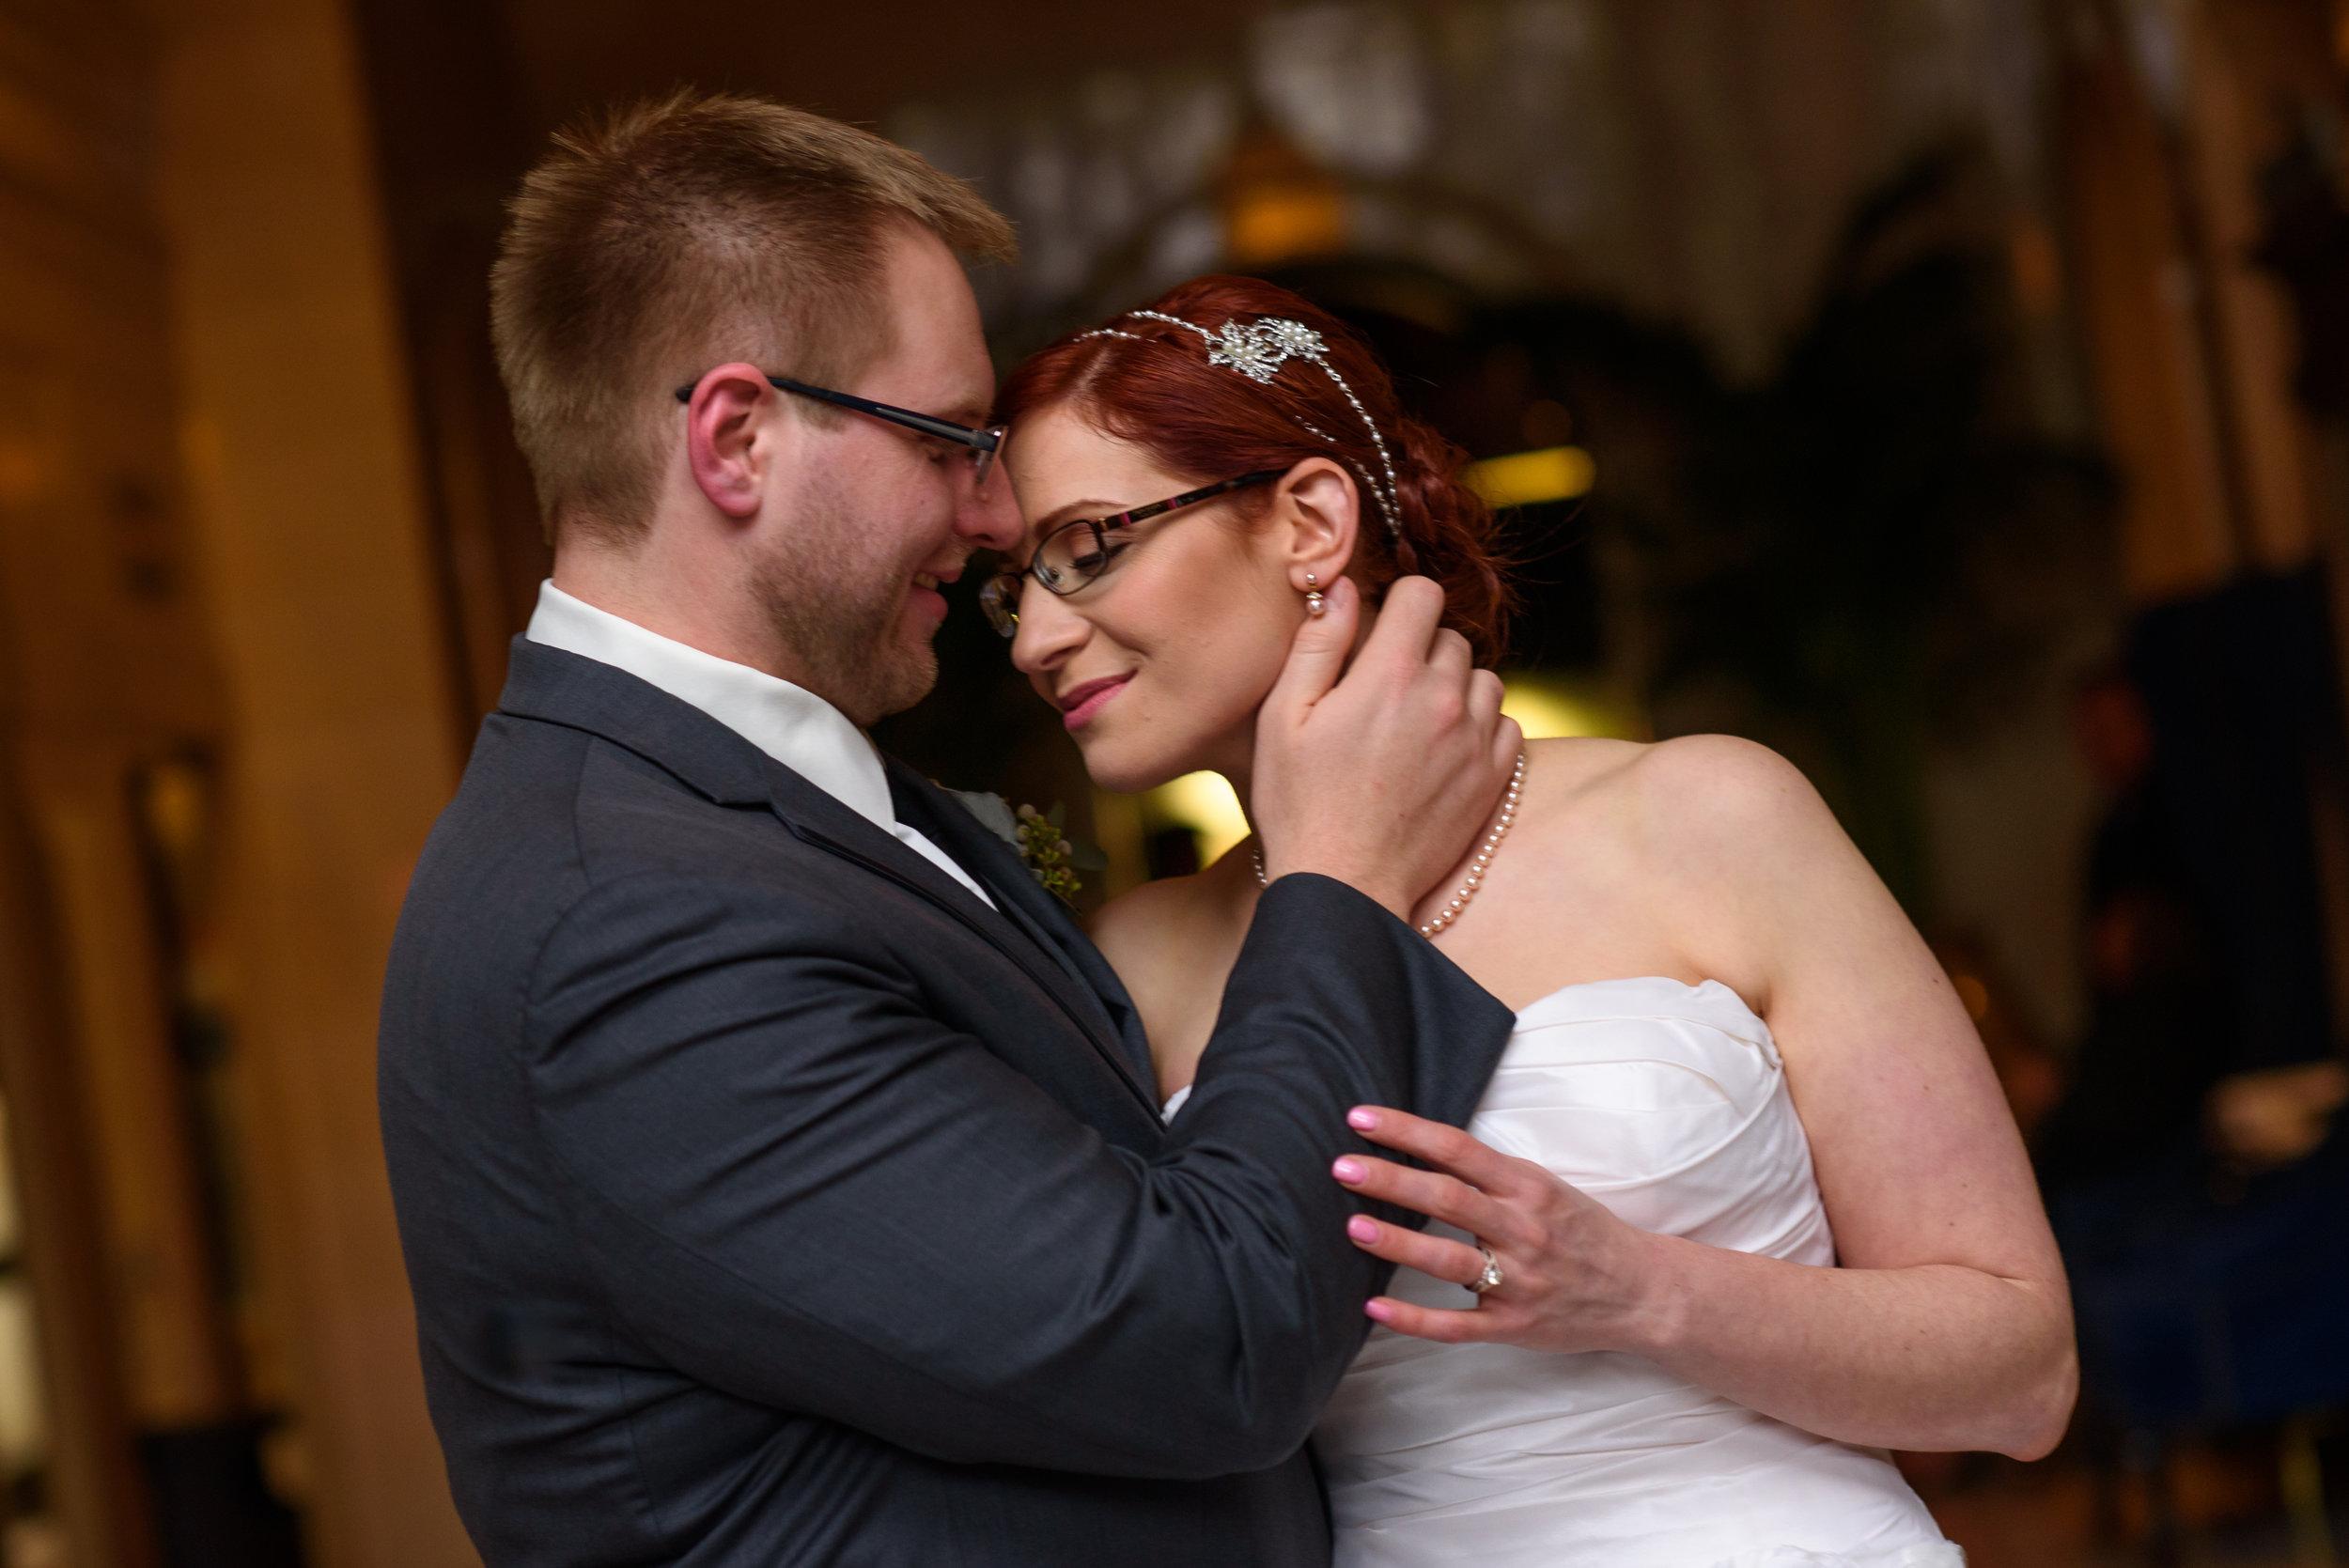 judith-john-010-citizen-hotel-sacramento-wedding-photographer-katherine-nicole-photography.JPG